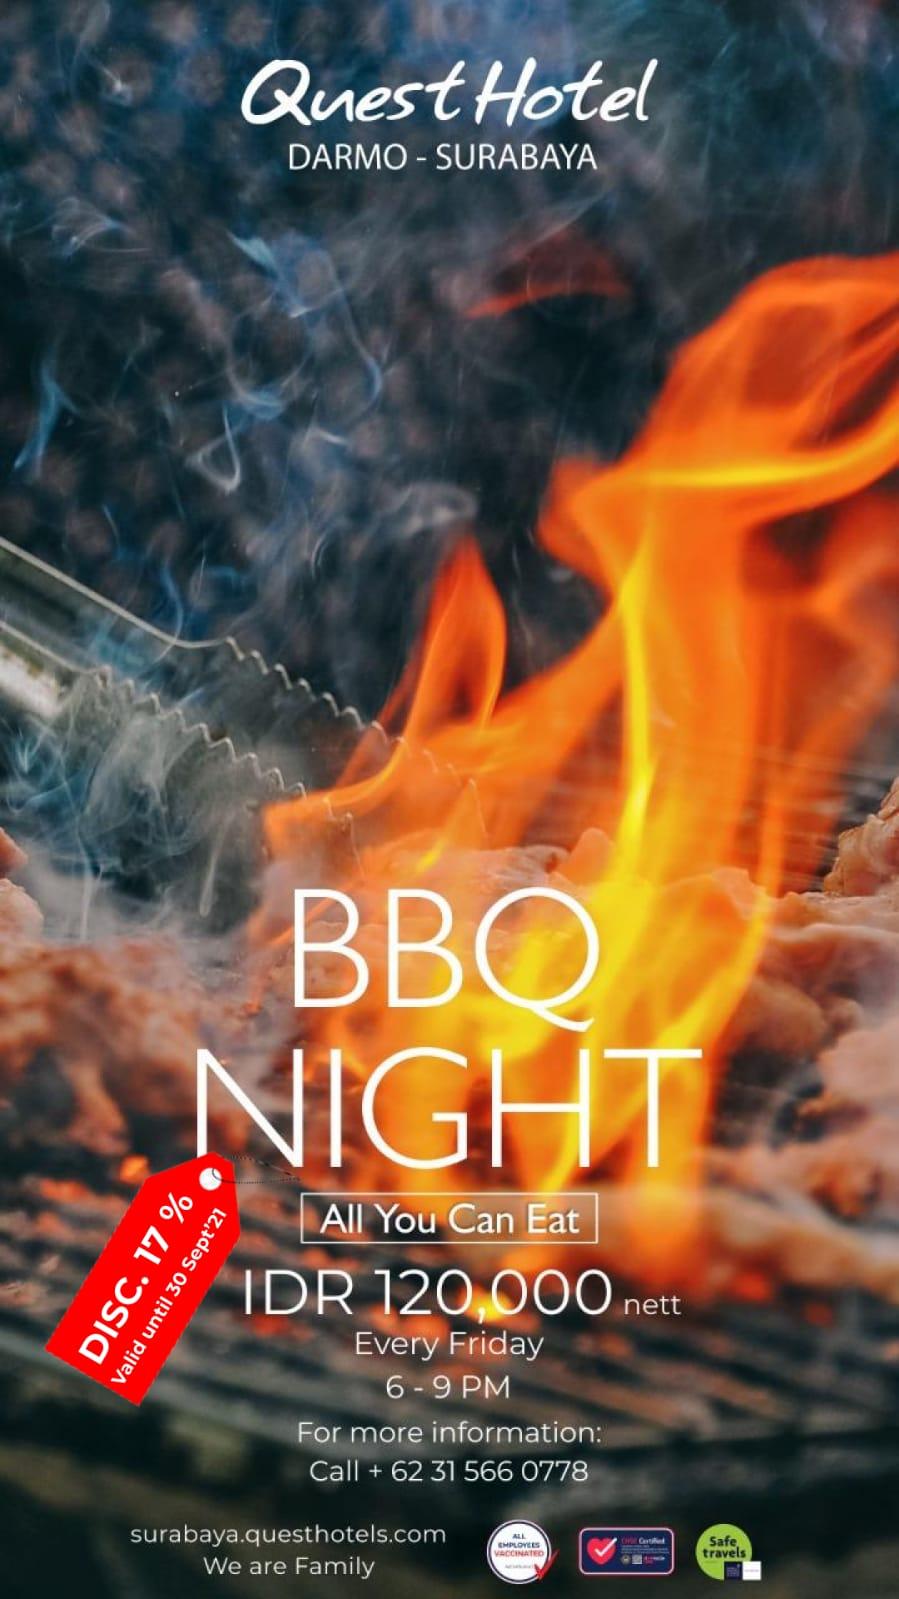 BBQ Night hanya di Quest Hotel Darmo Surabaya